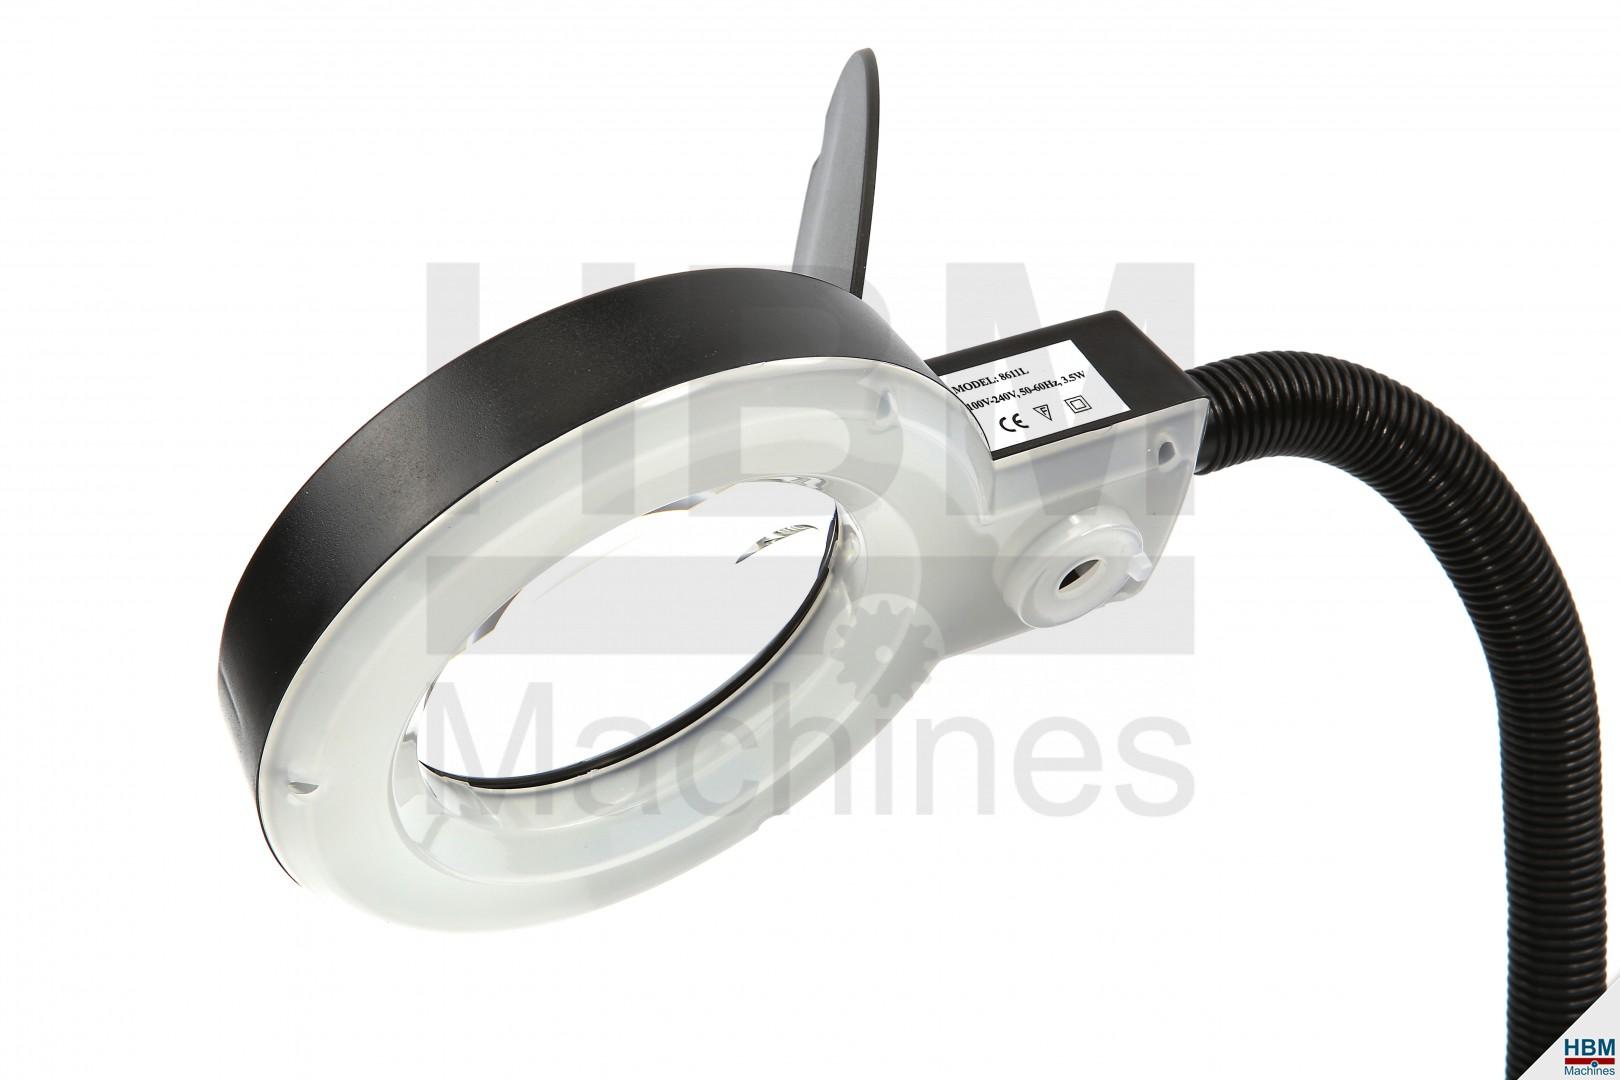 hbm verstelbare loupelamp met led verlichting klein zwart. Black Bedroom Furniture Sets. Home Design Ideas